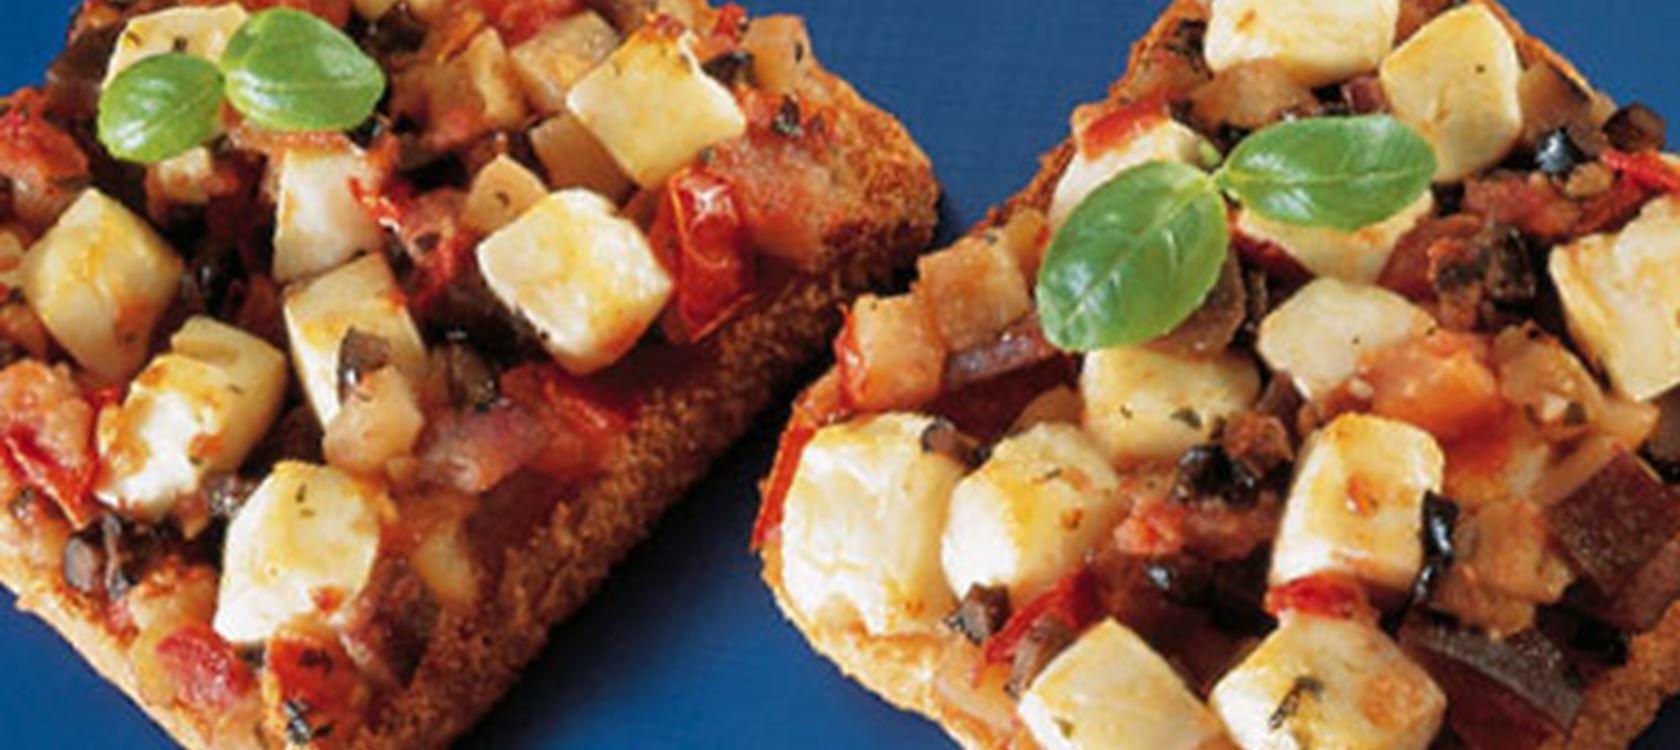 Toast Mediterrane stijl